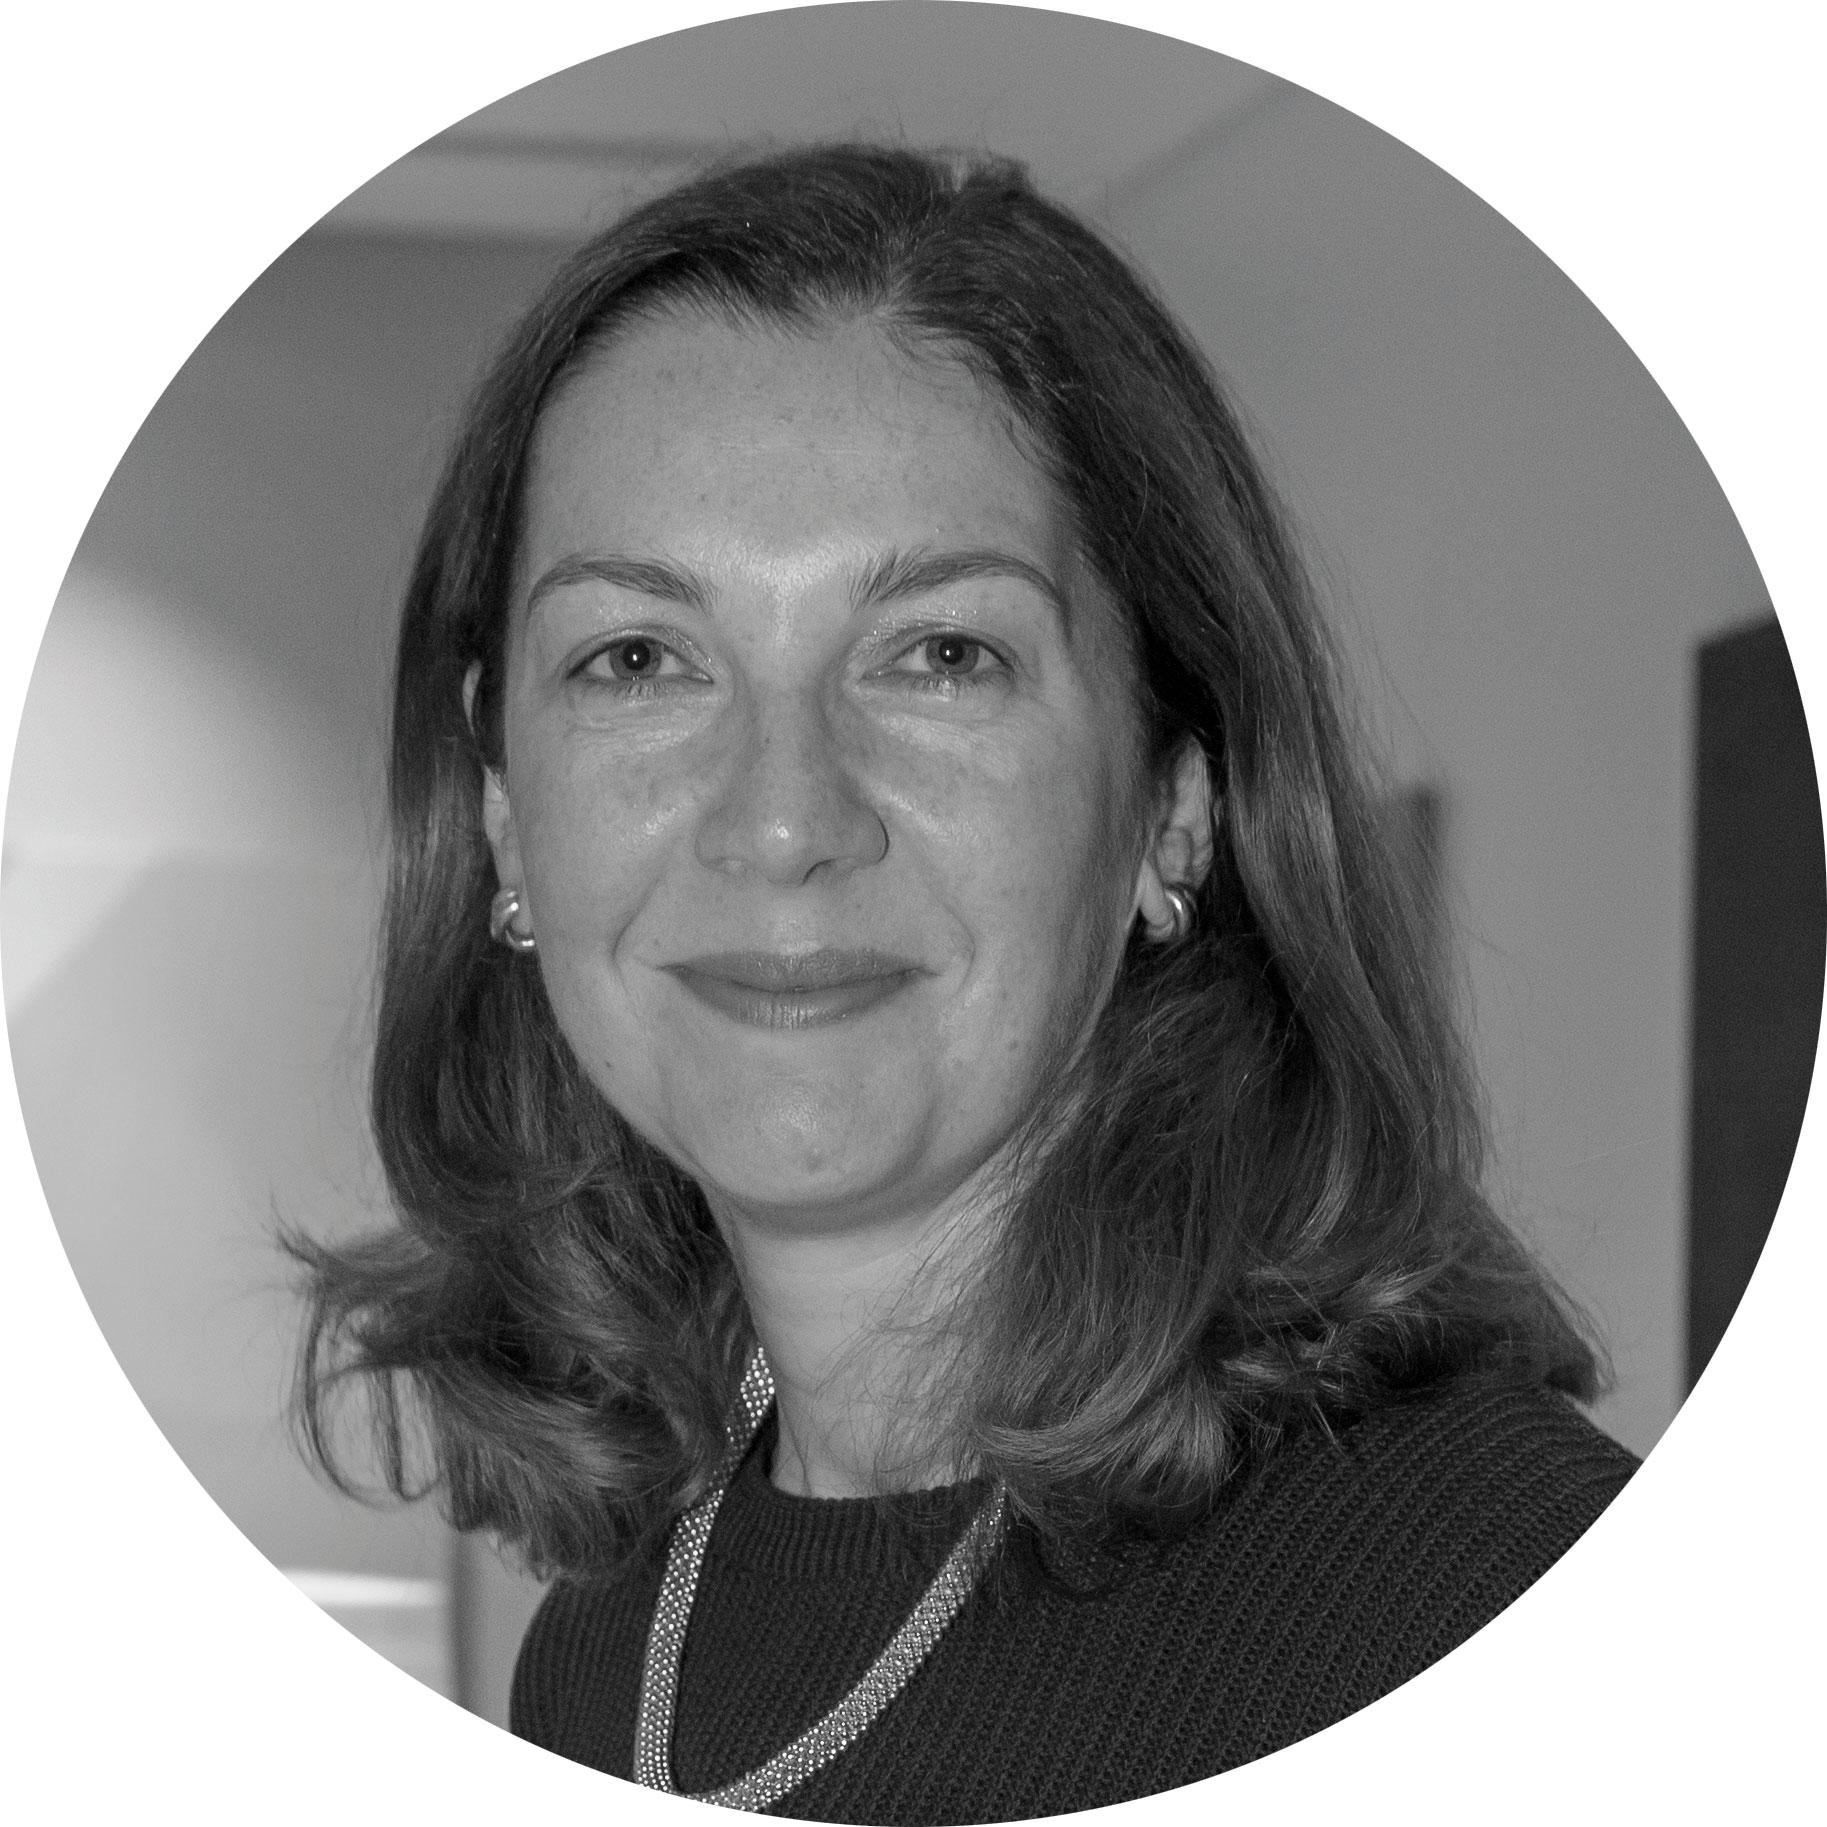 Margaret Davies, VP global account management for EMEA media at Brightcove